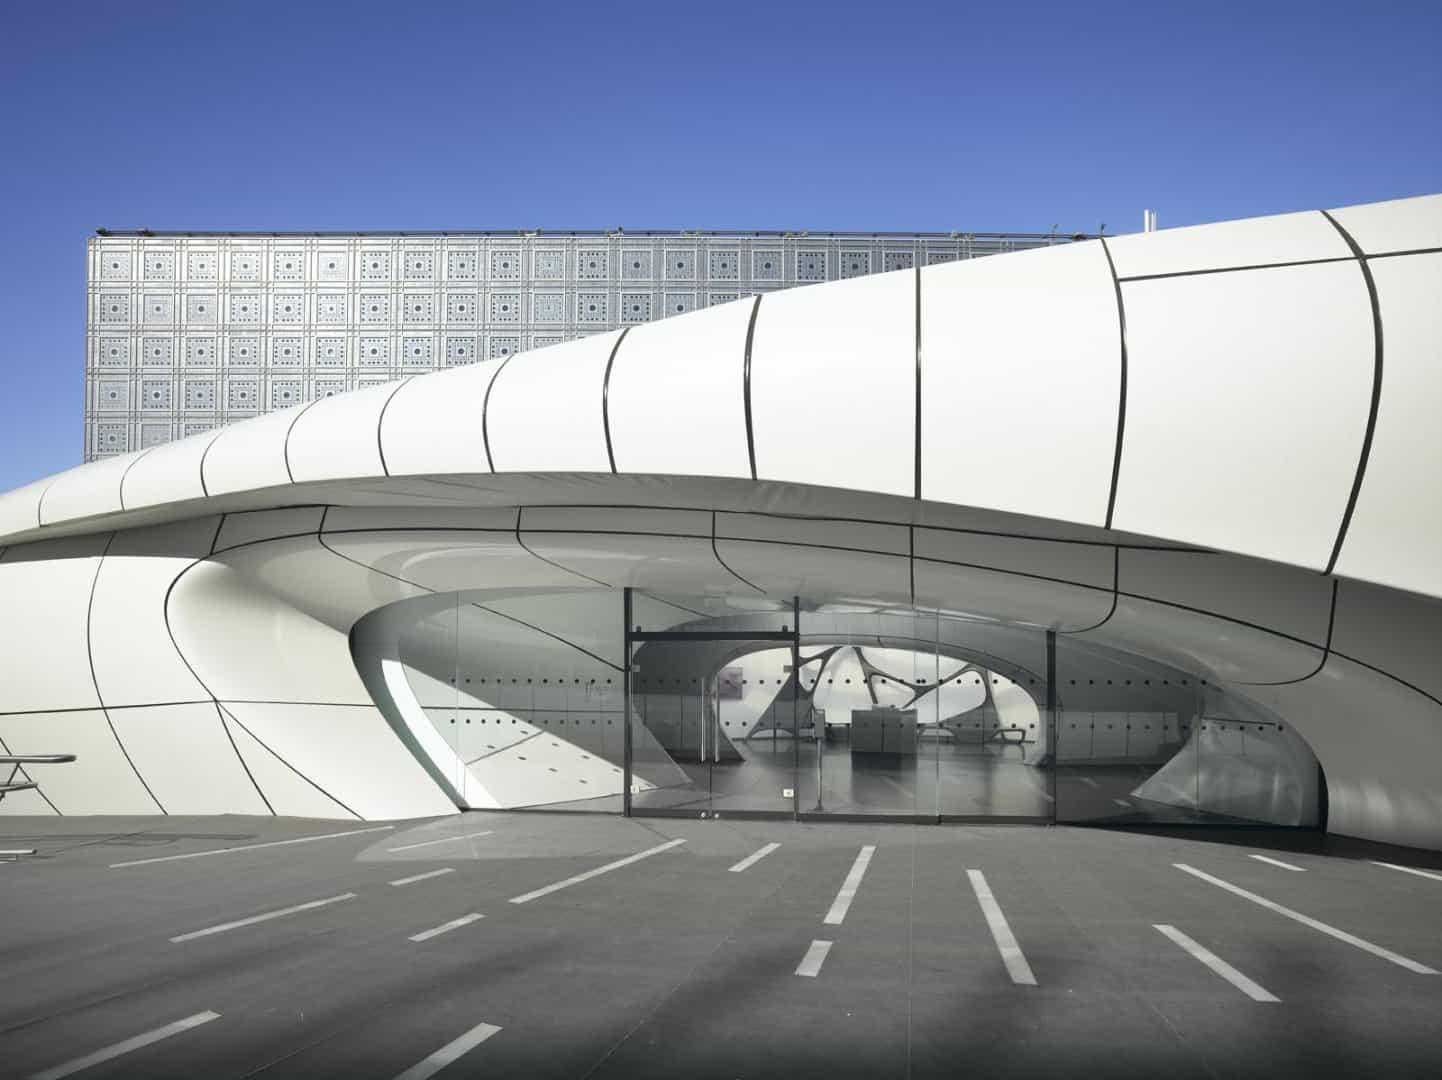 Zaha Hadid Design - Mobile Art Chanel Pavilion - rolandhalbe_paris3